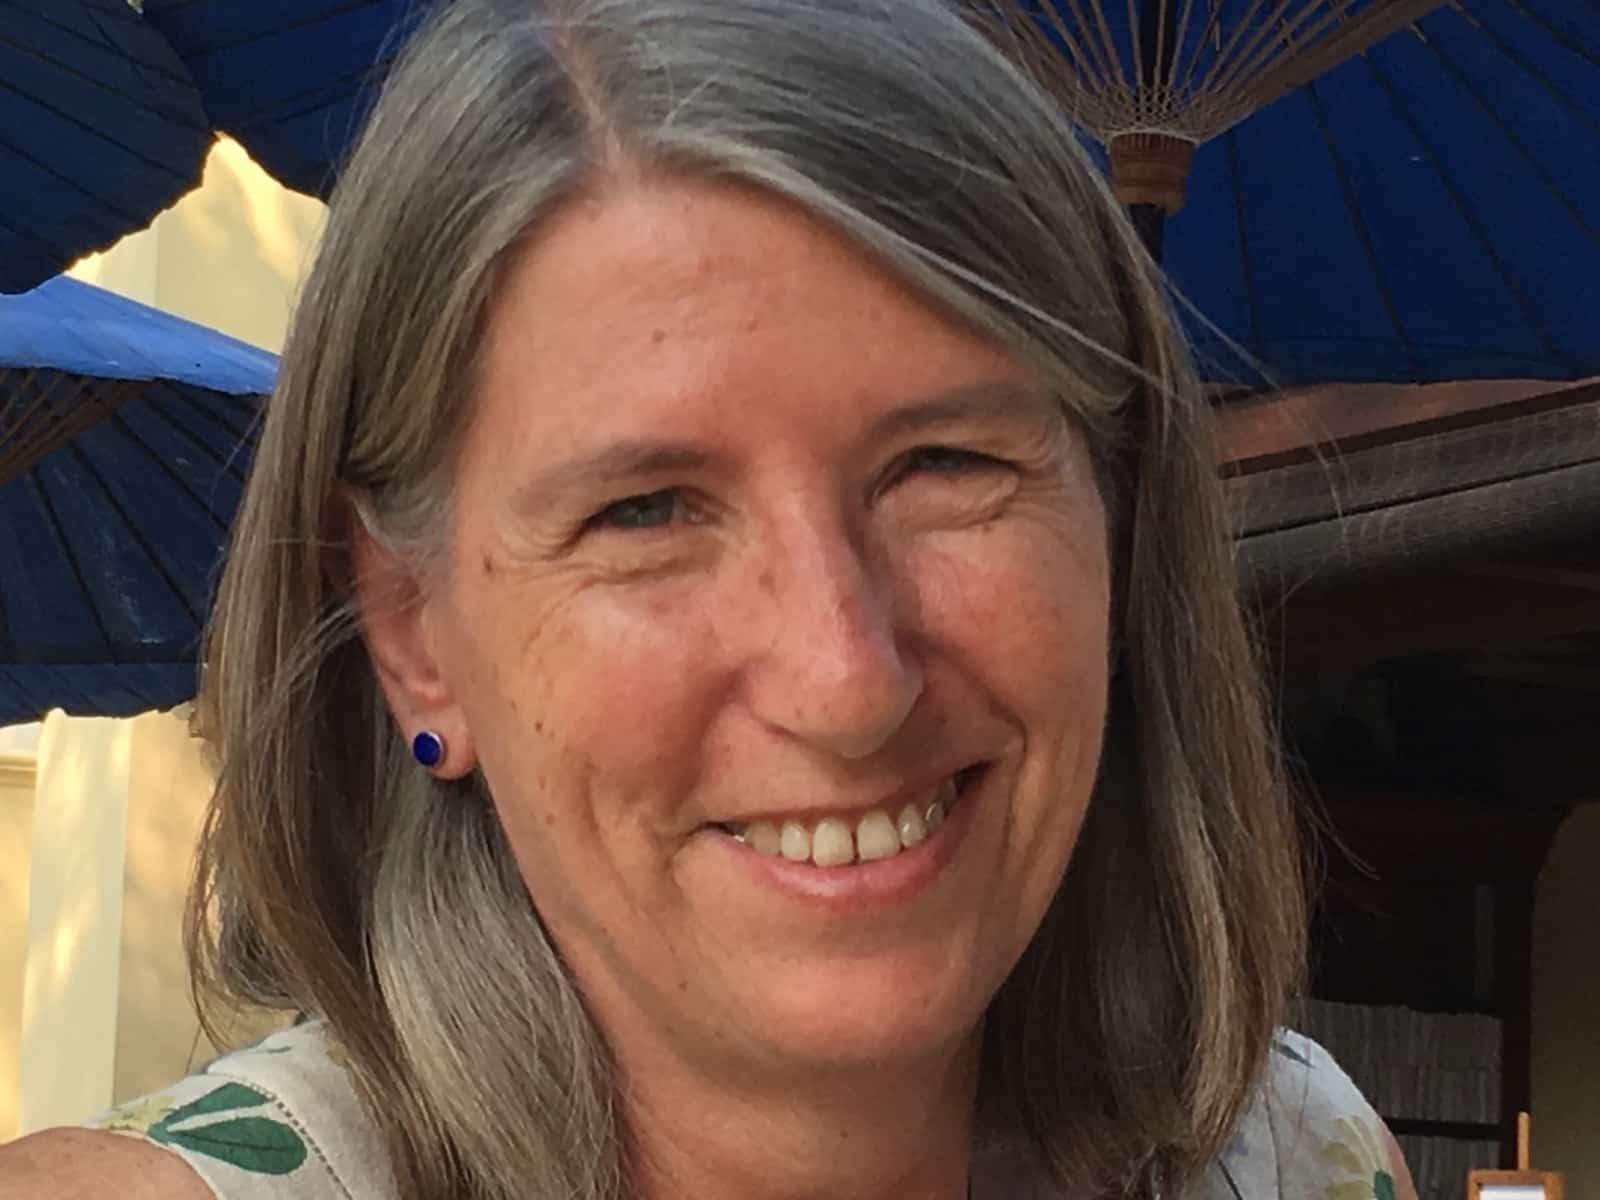 Jane martha from London, United Kingdom